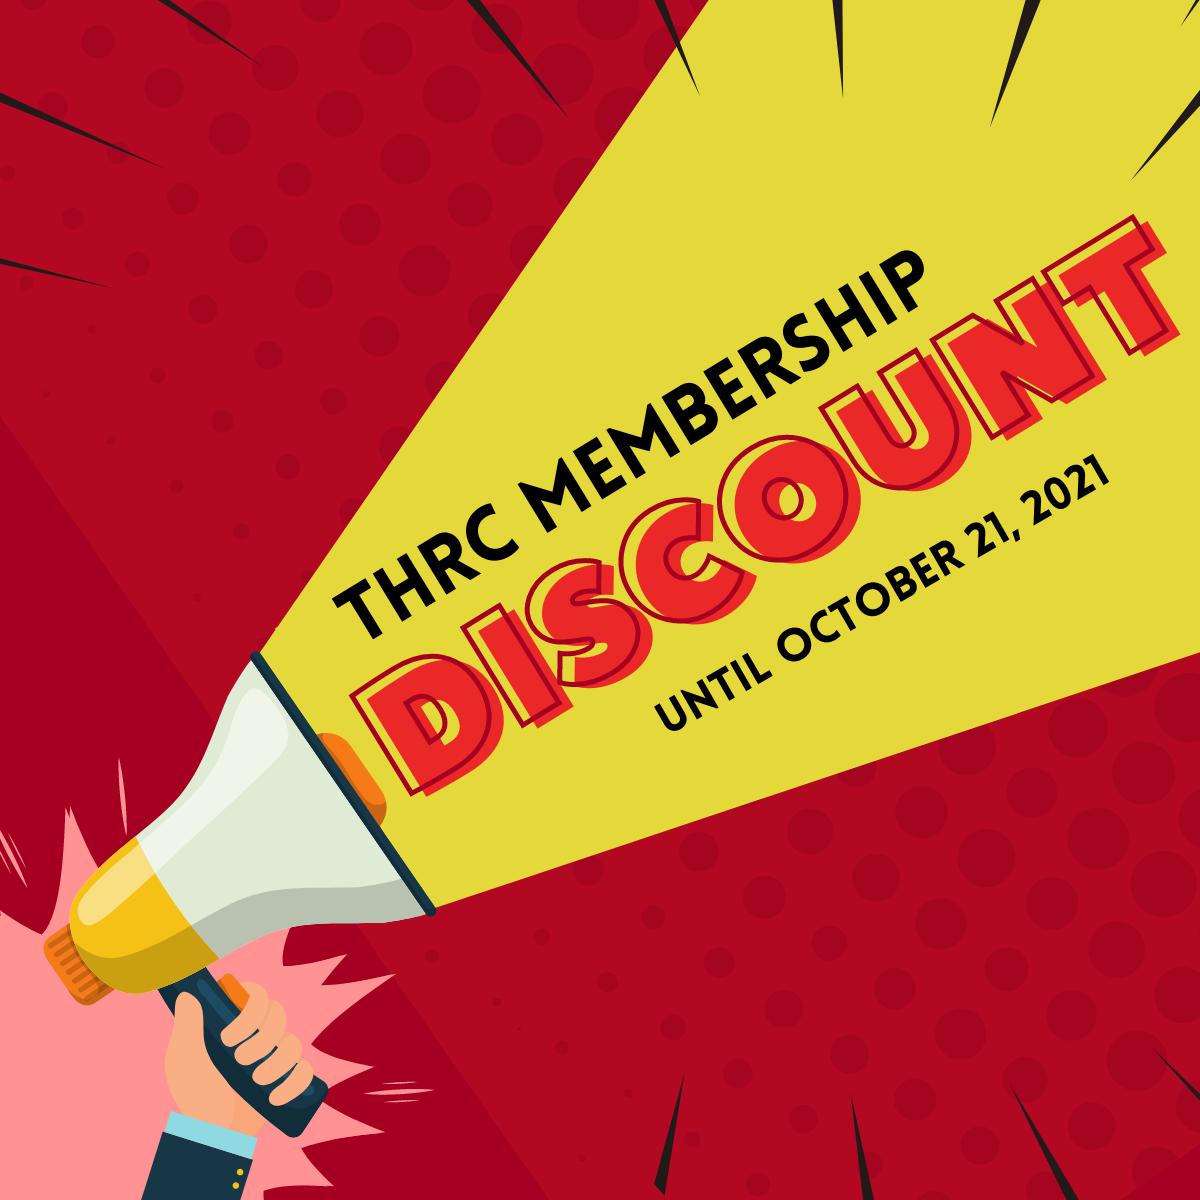 THRC Membership Discount Until October 21, 2021 banner